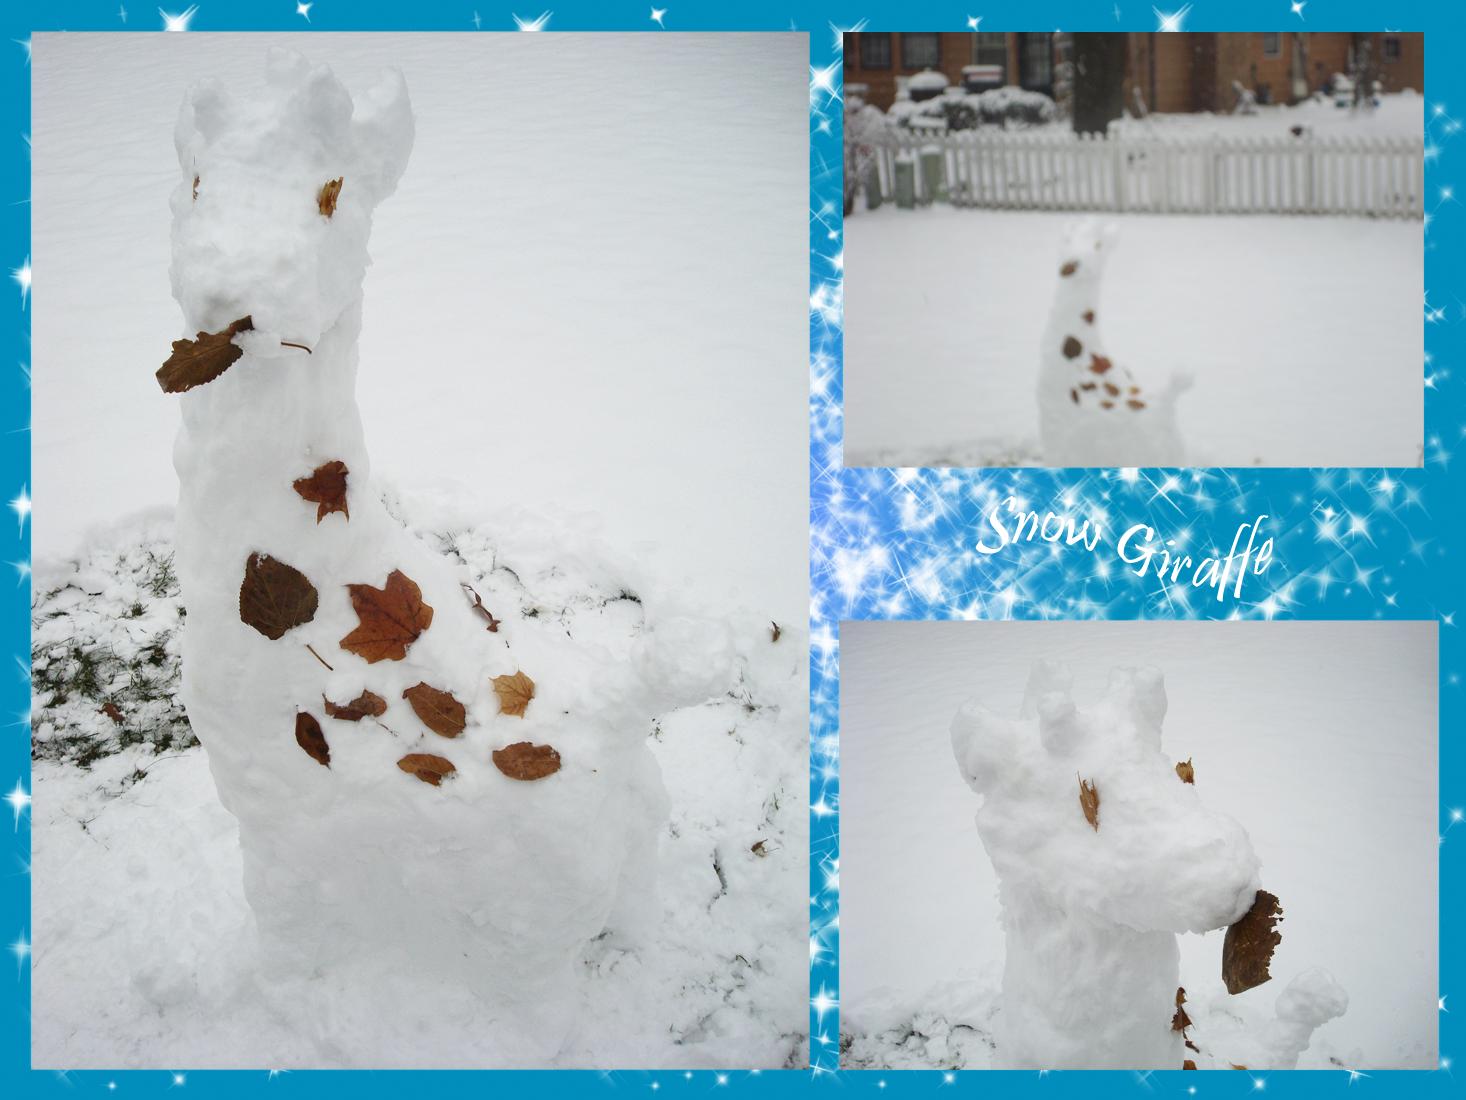 Snow Giraffe